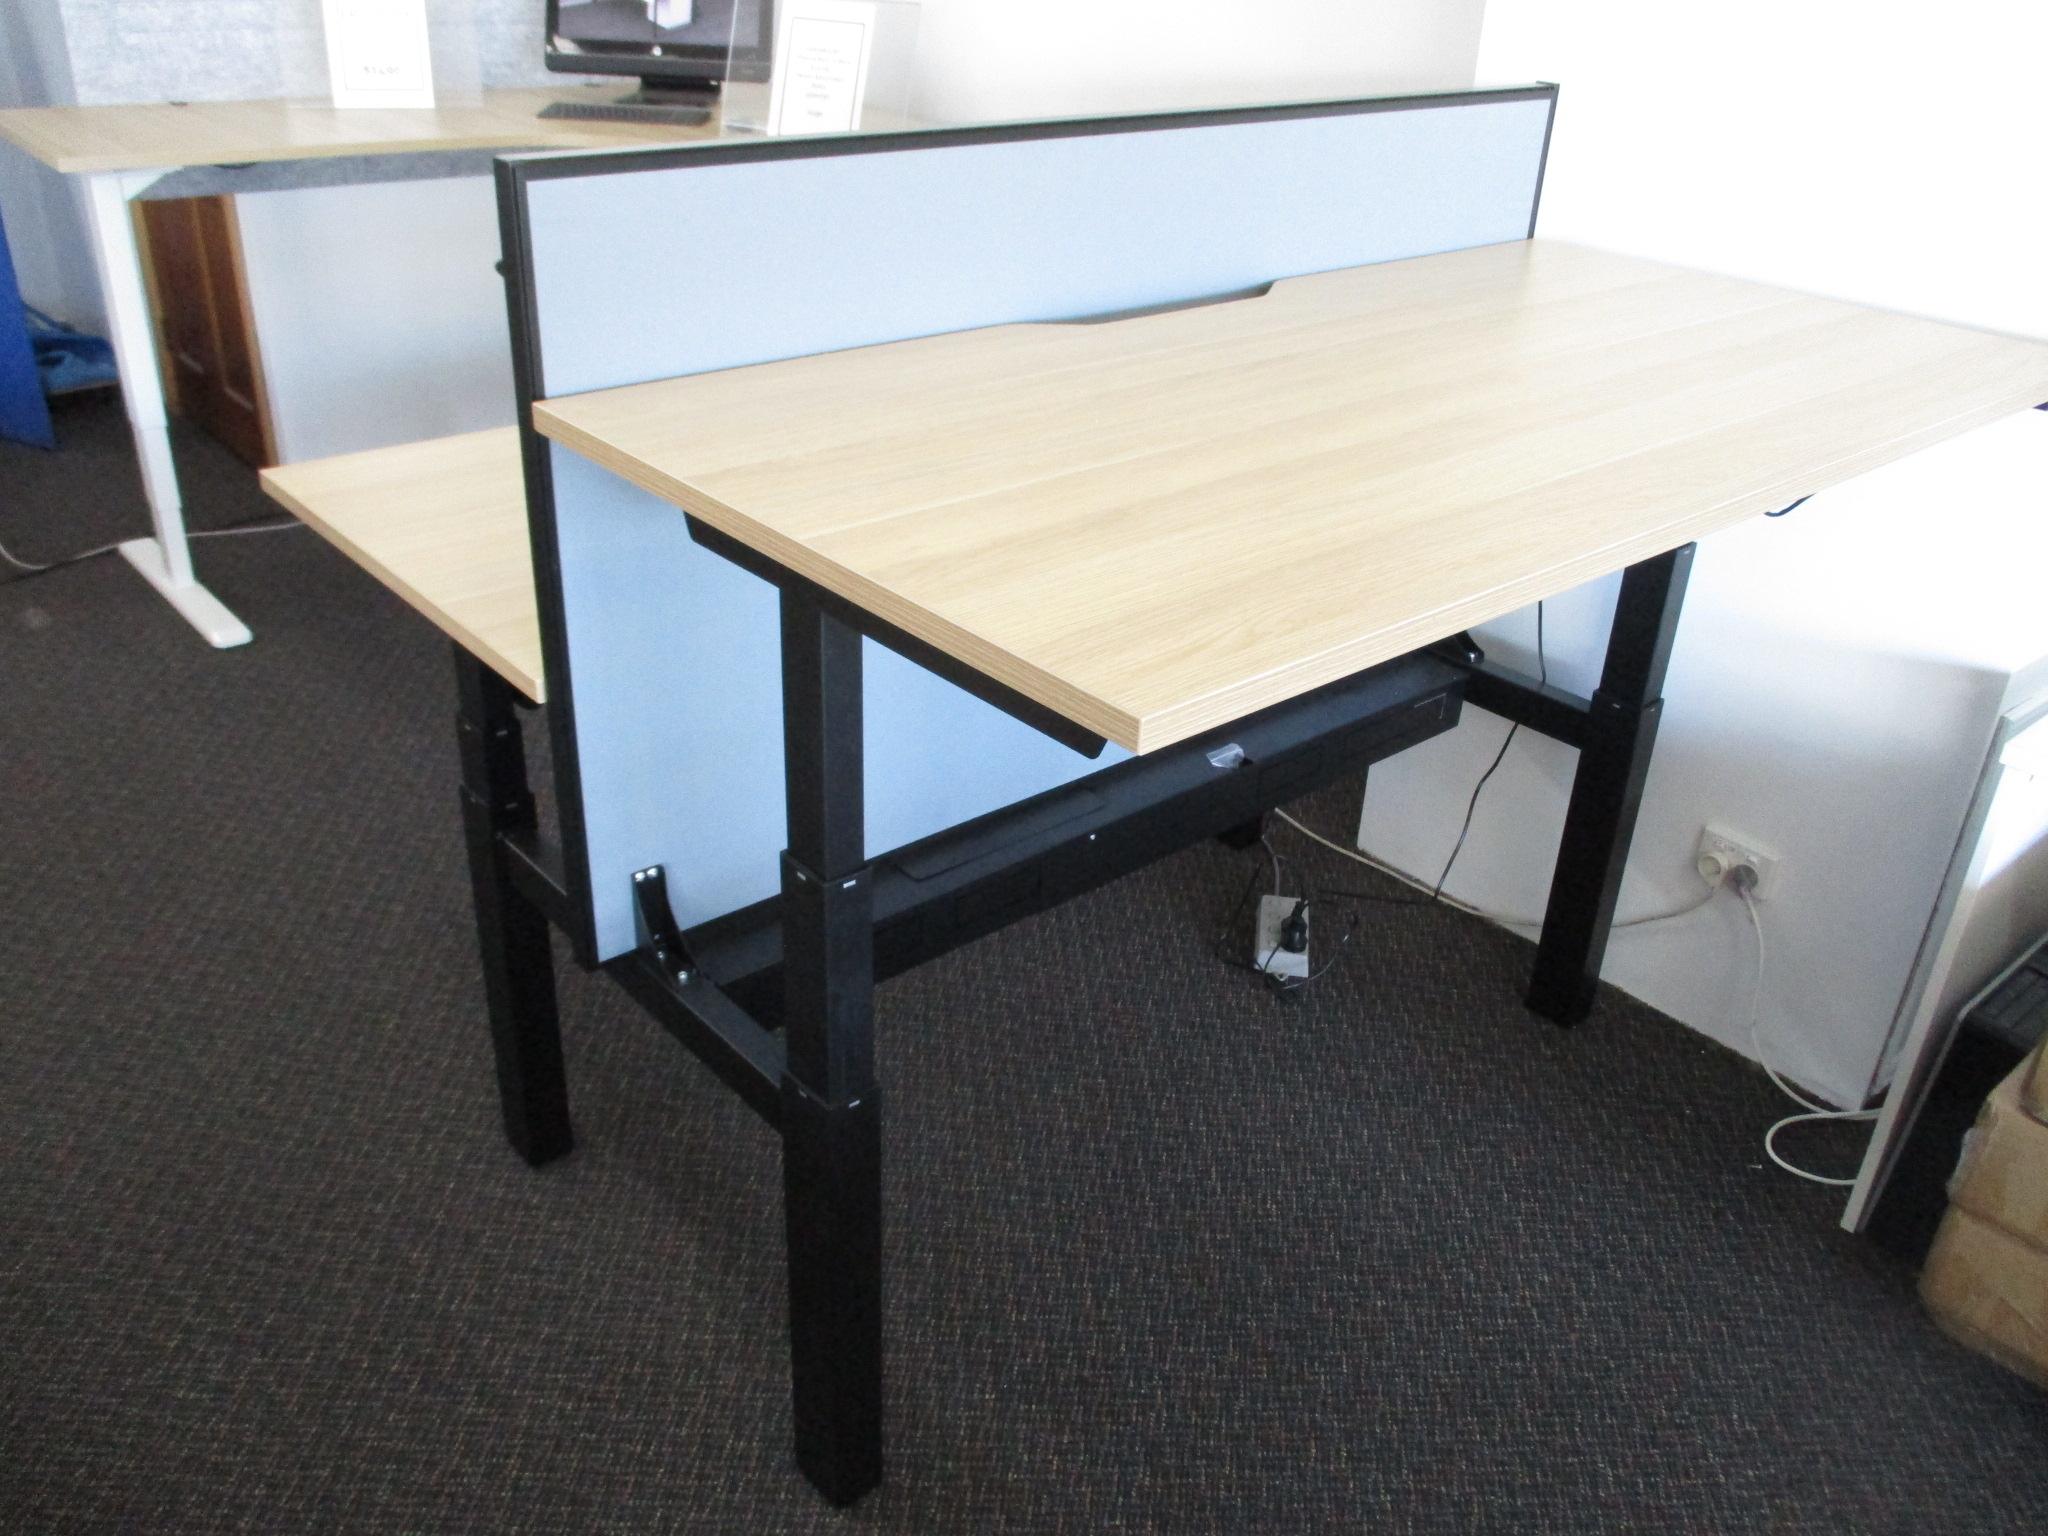 New Paramount B2B Height Adjustable 2 Person Desk $2390